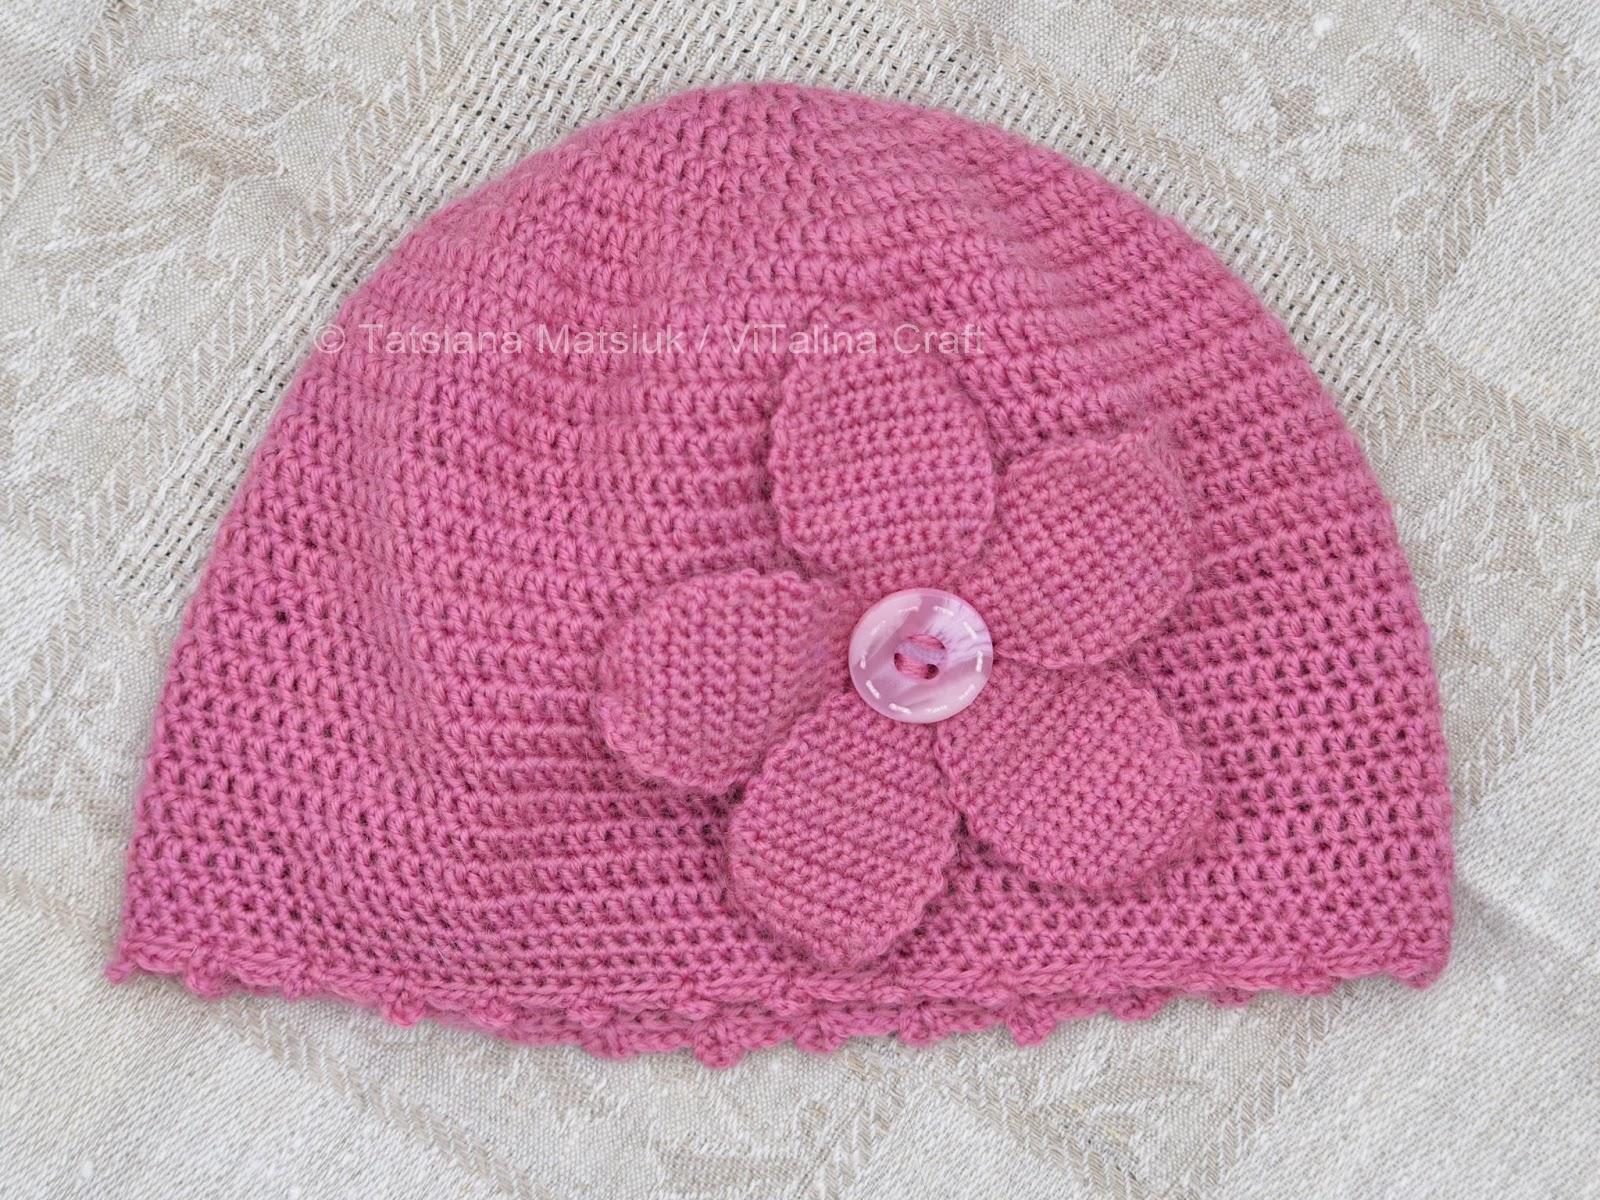 Peach Flower Baby Hat Knitting Pattern ViTalina Craft